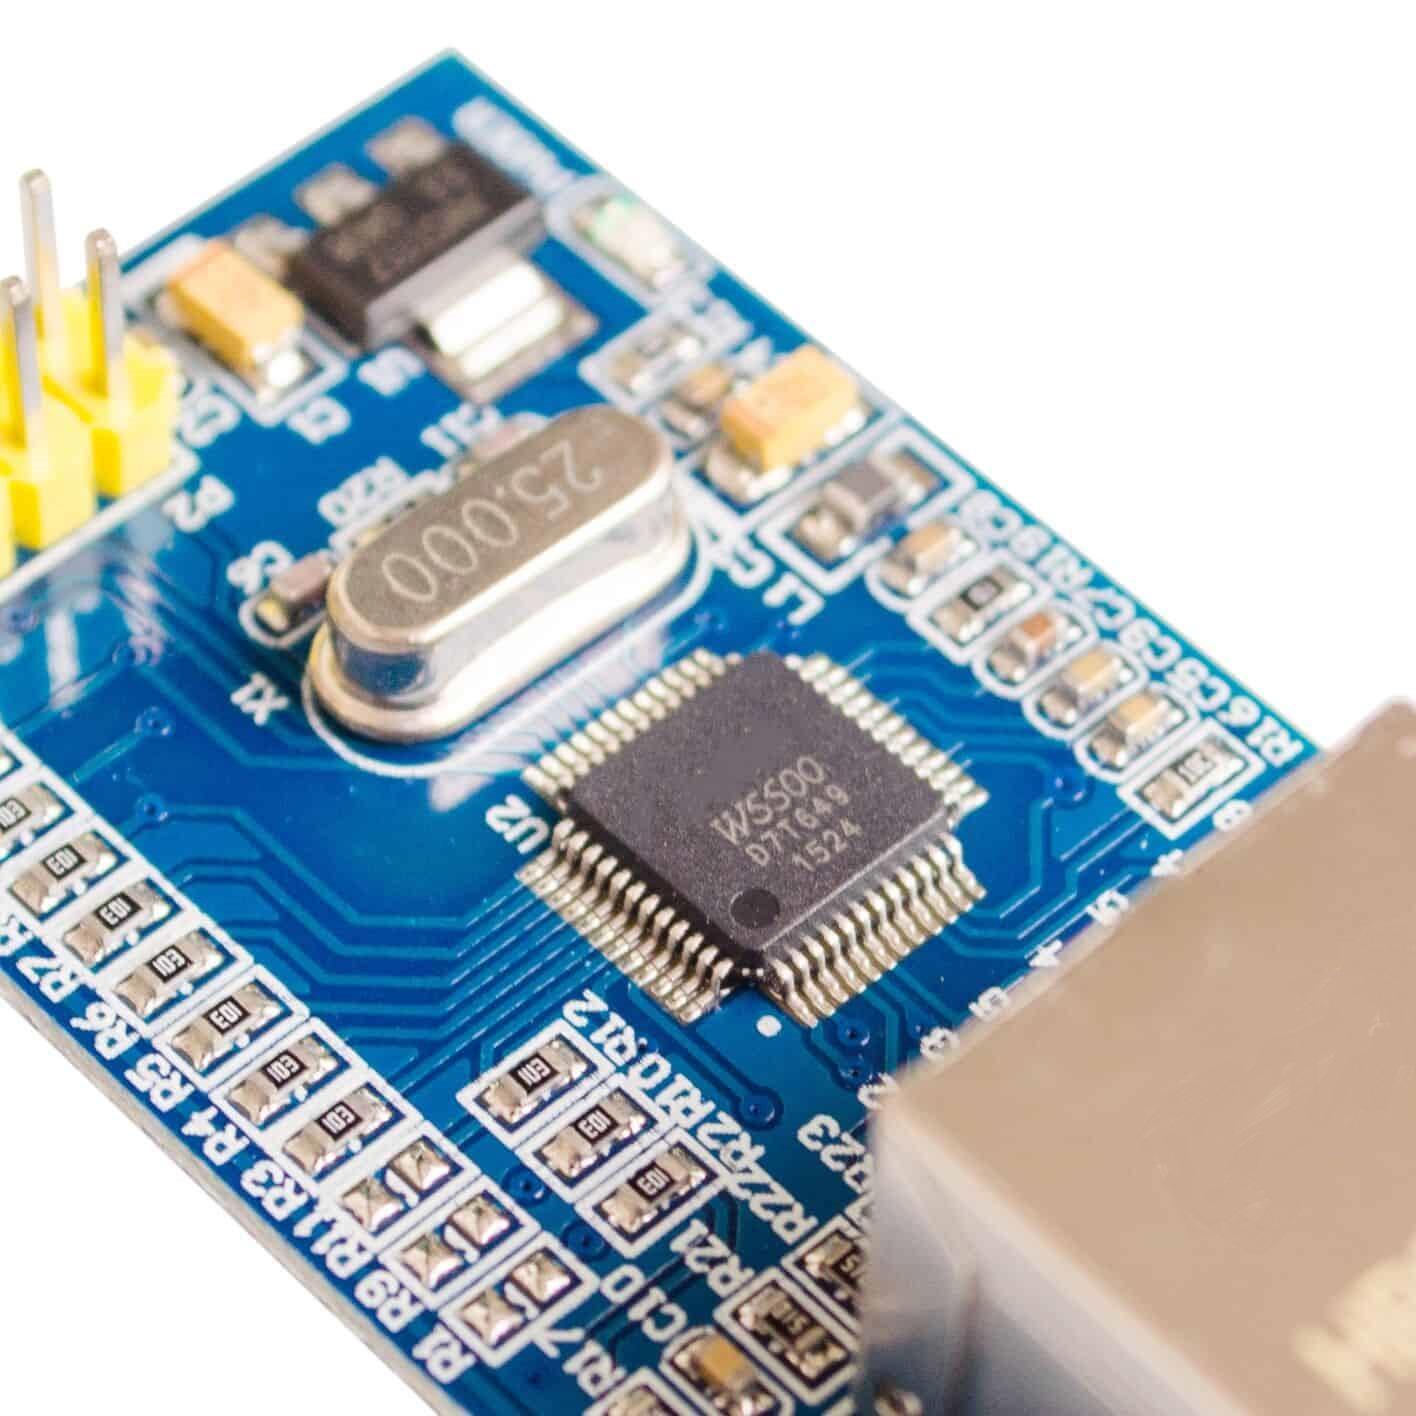 Okystar OEM/ODM W5500 Ethernet Network Module STM32 For Arduino